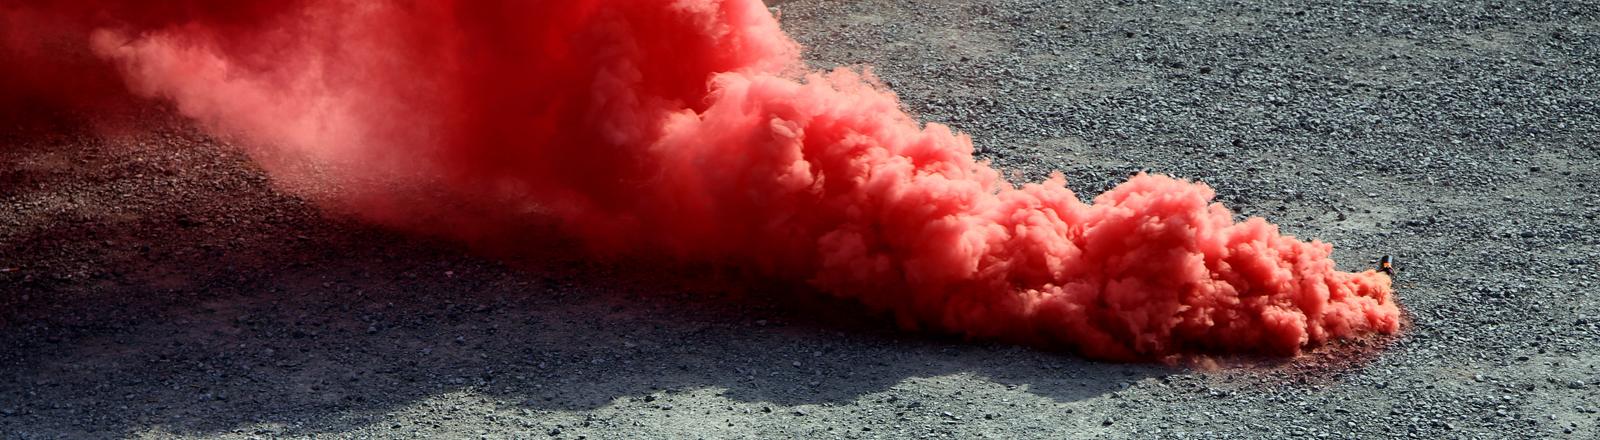 Rote Rauchbombe qualmt